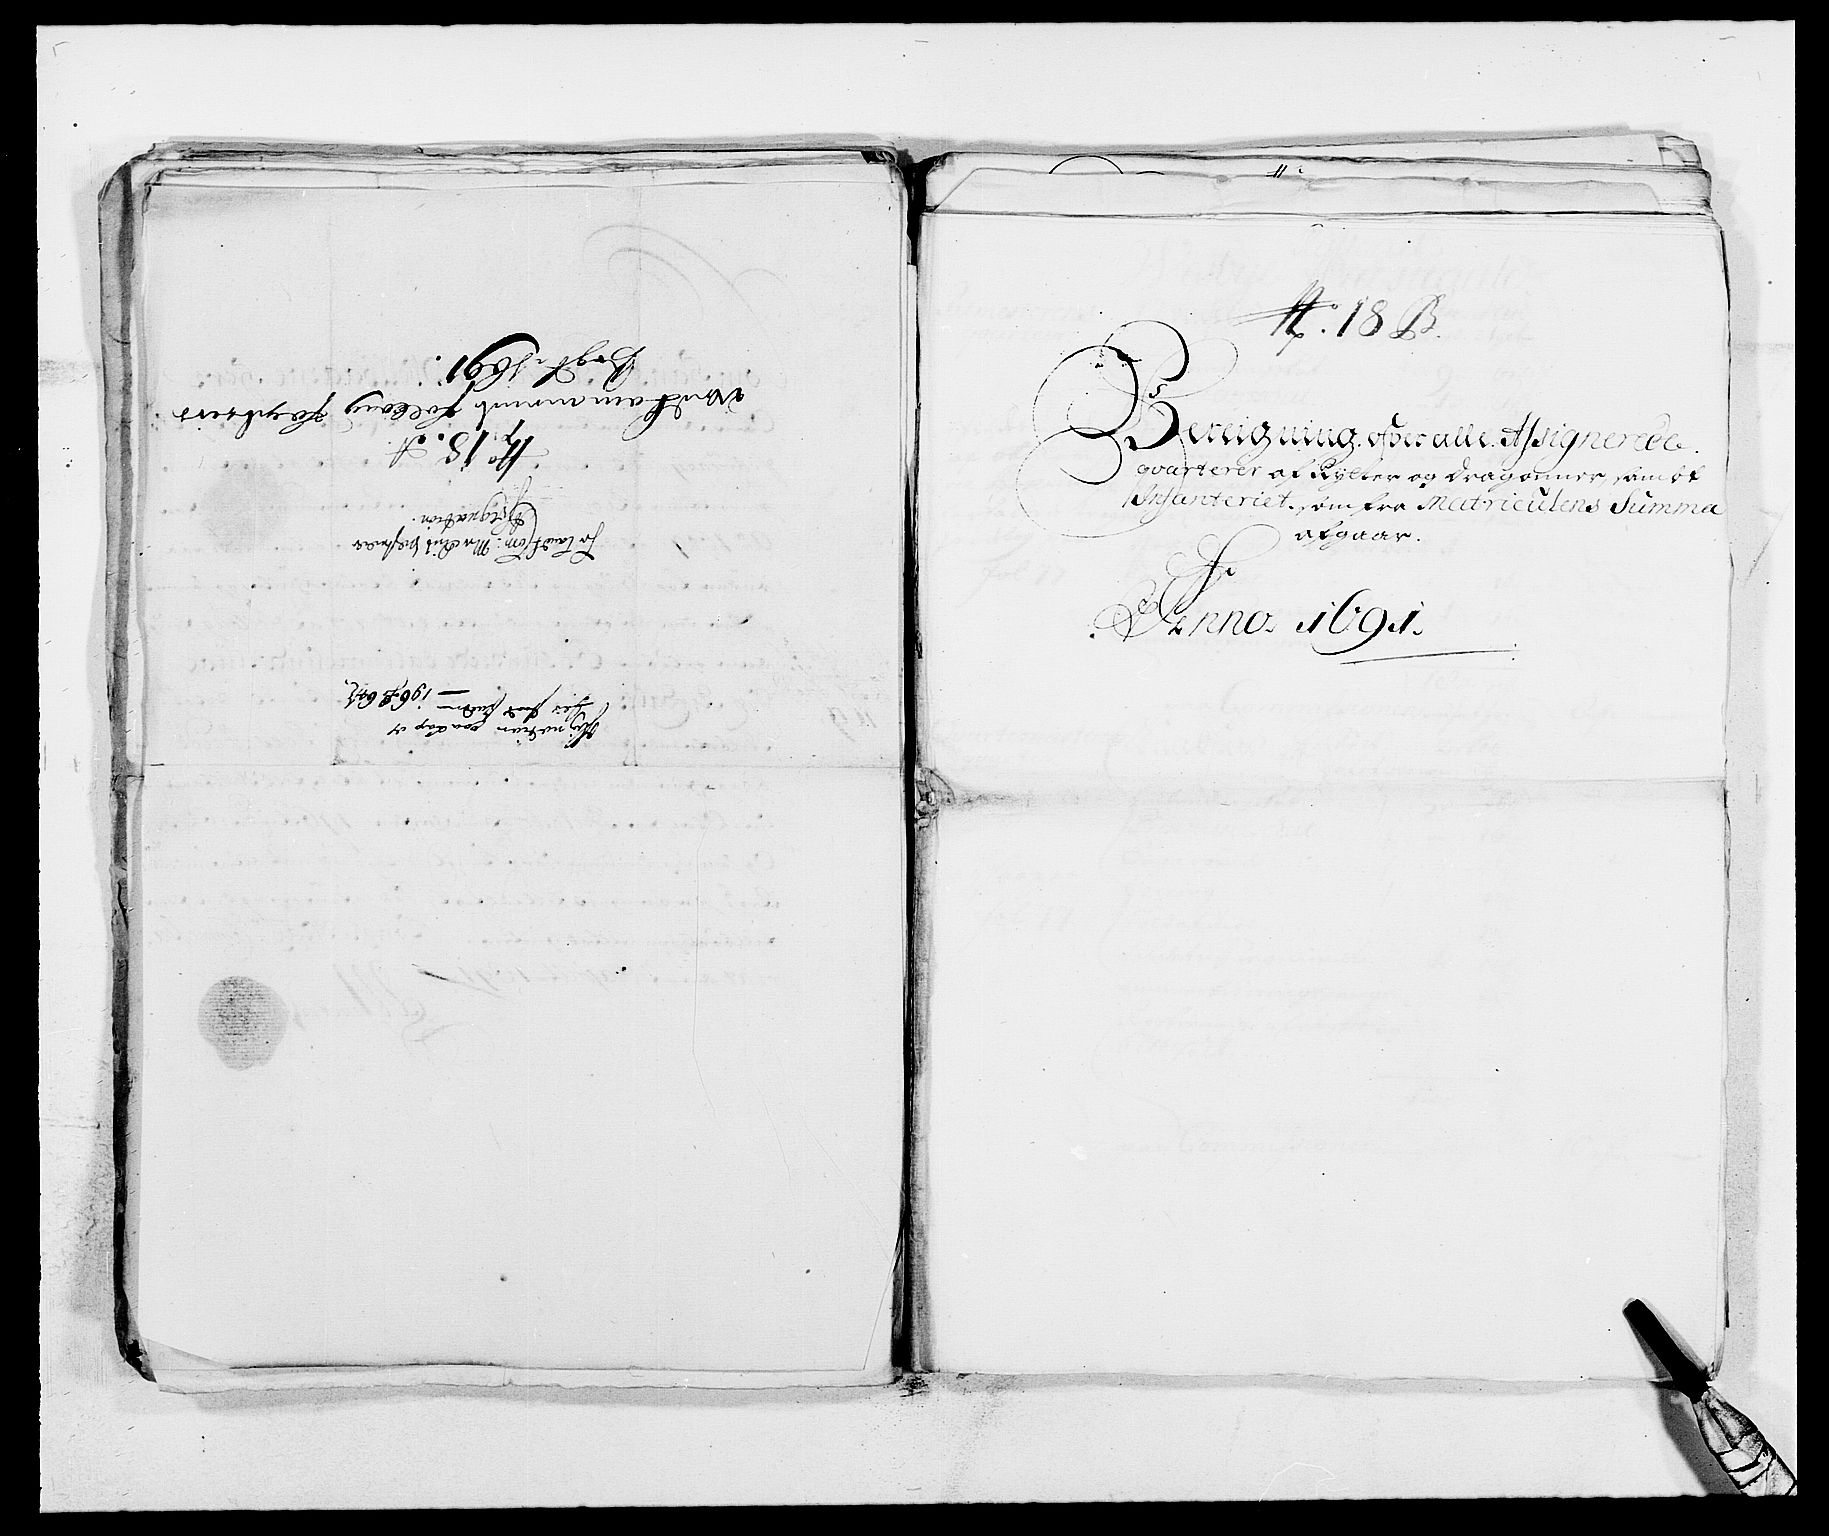 RA, Rentekammeret inntil 1814, Reviderte regnskaper, Fogderegnskap, R09/L0436: Fogderegnskap Follo, 1685-1691, s. 211